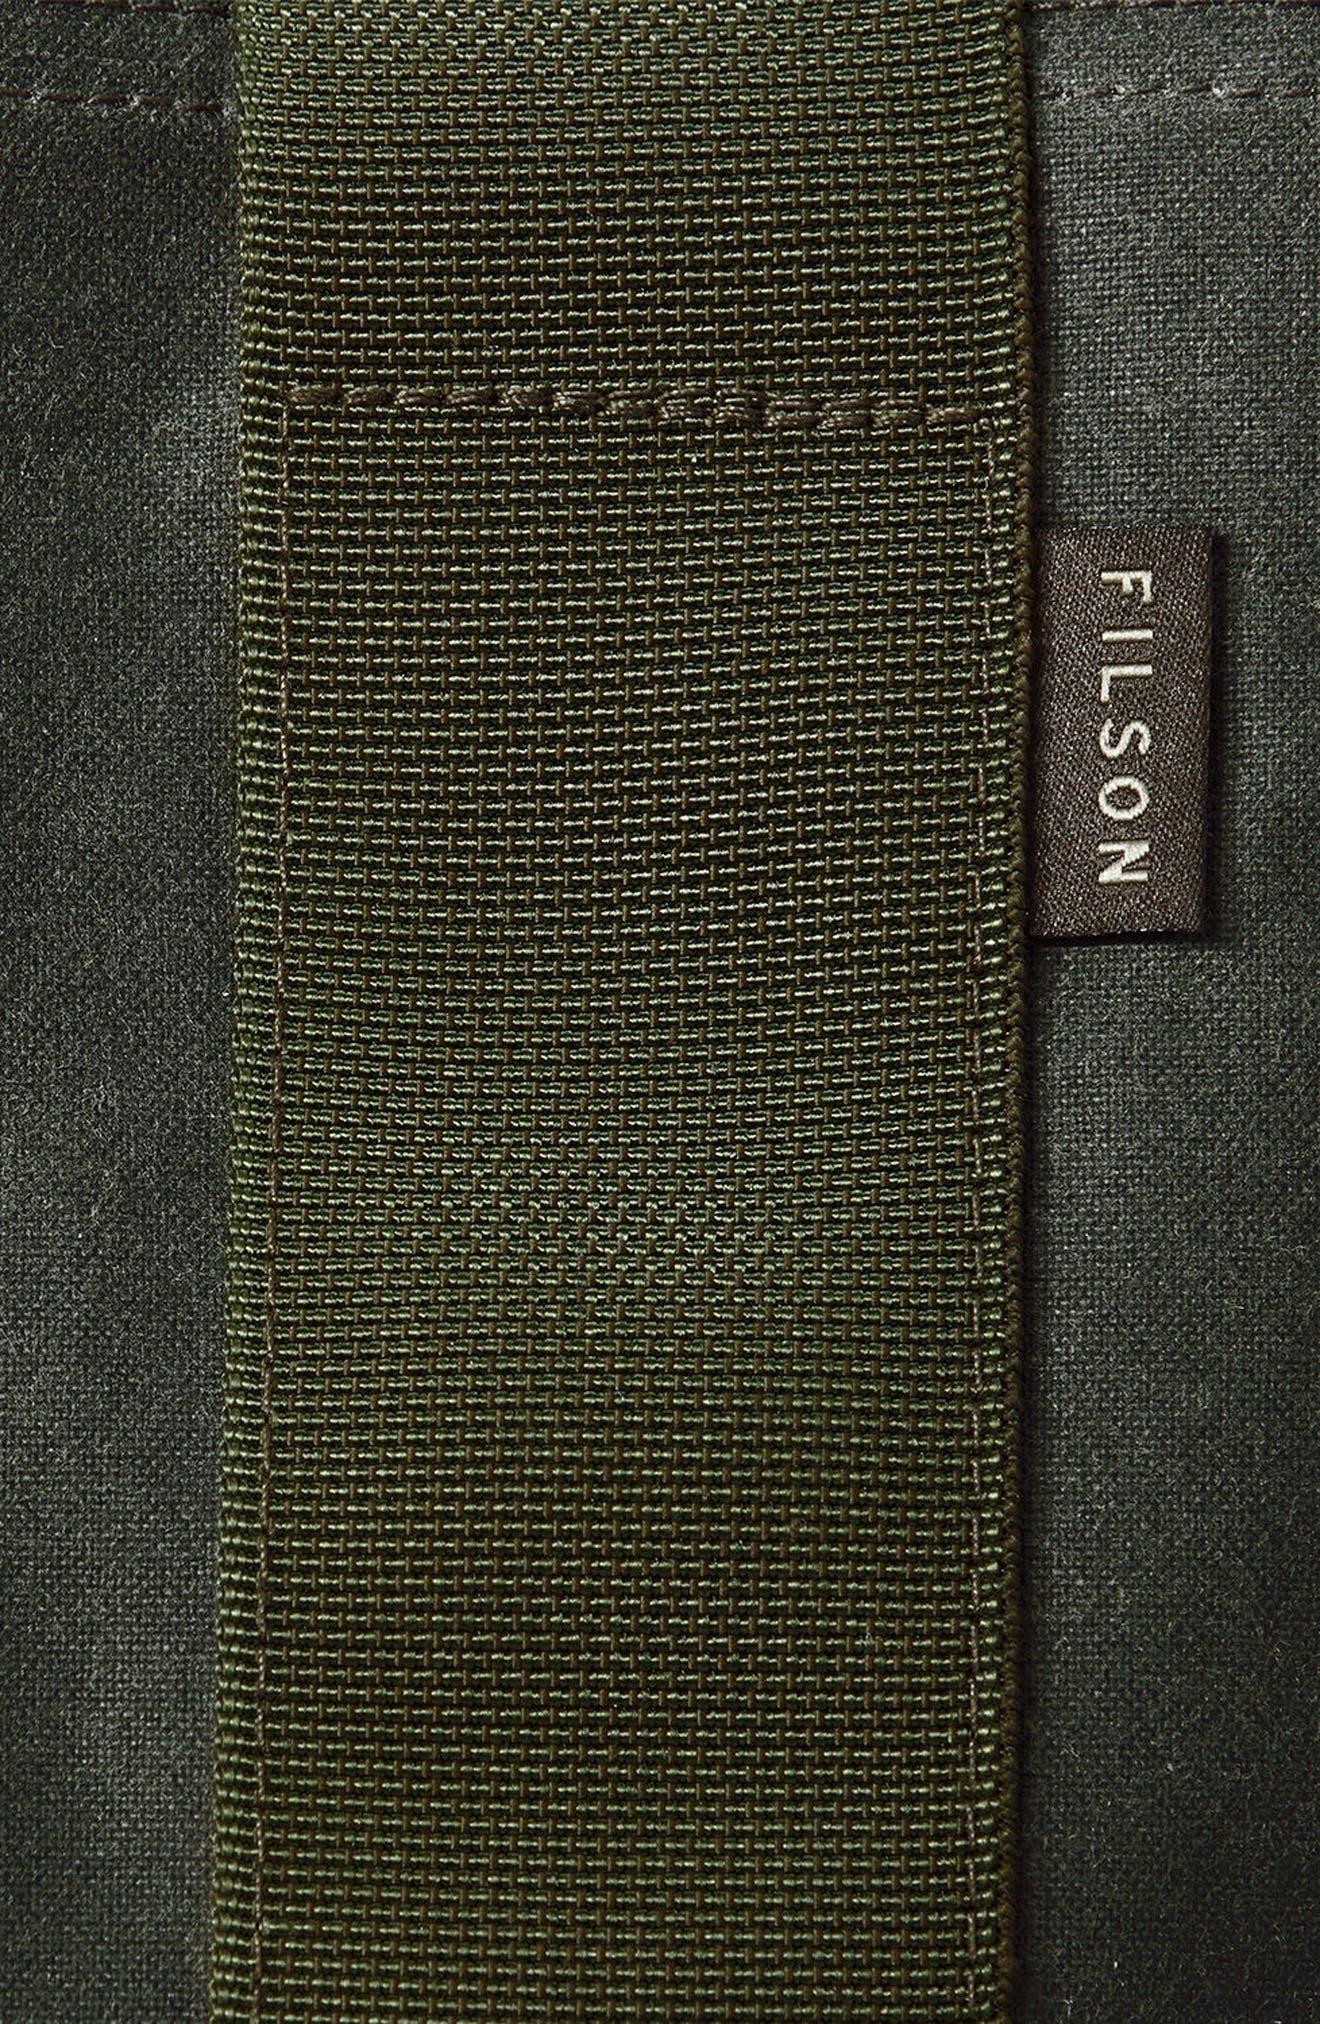 Convertible Duffel Bag,                             Alternate thumbnail 8, color,                             Otter Green